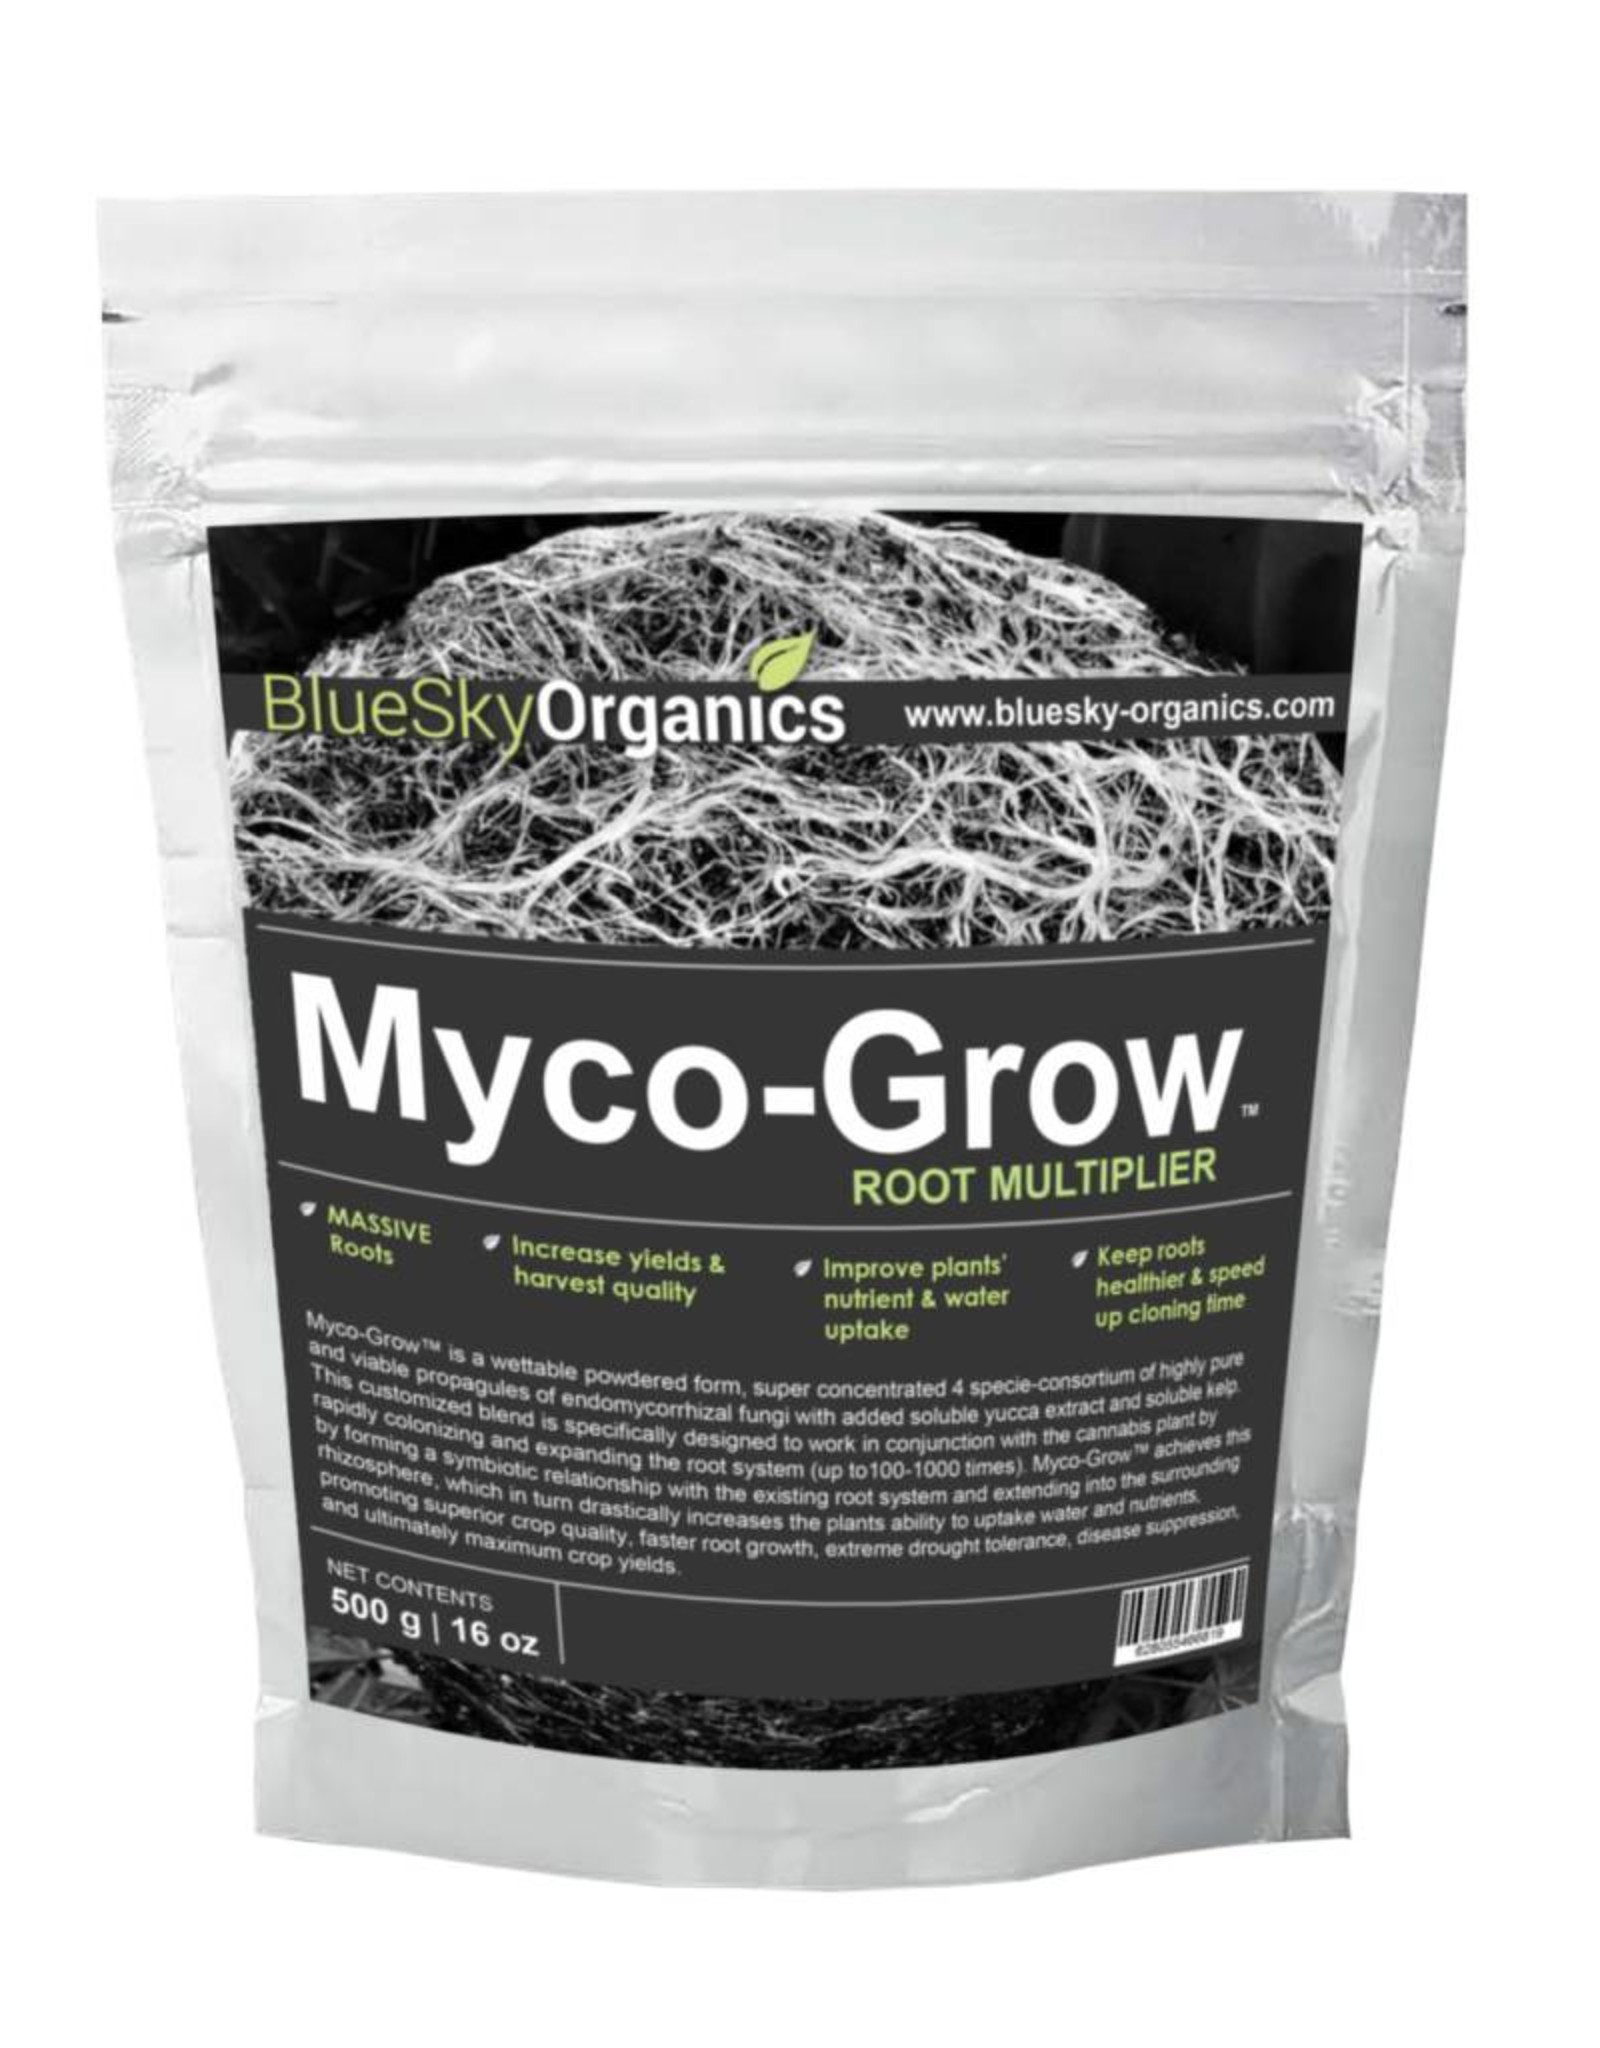 BlueSky Organics Myco-Grow 1000g